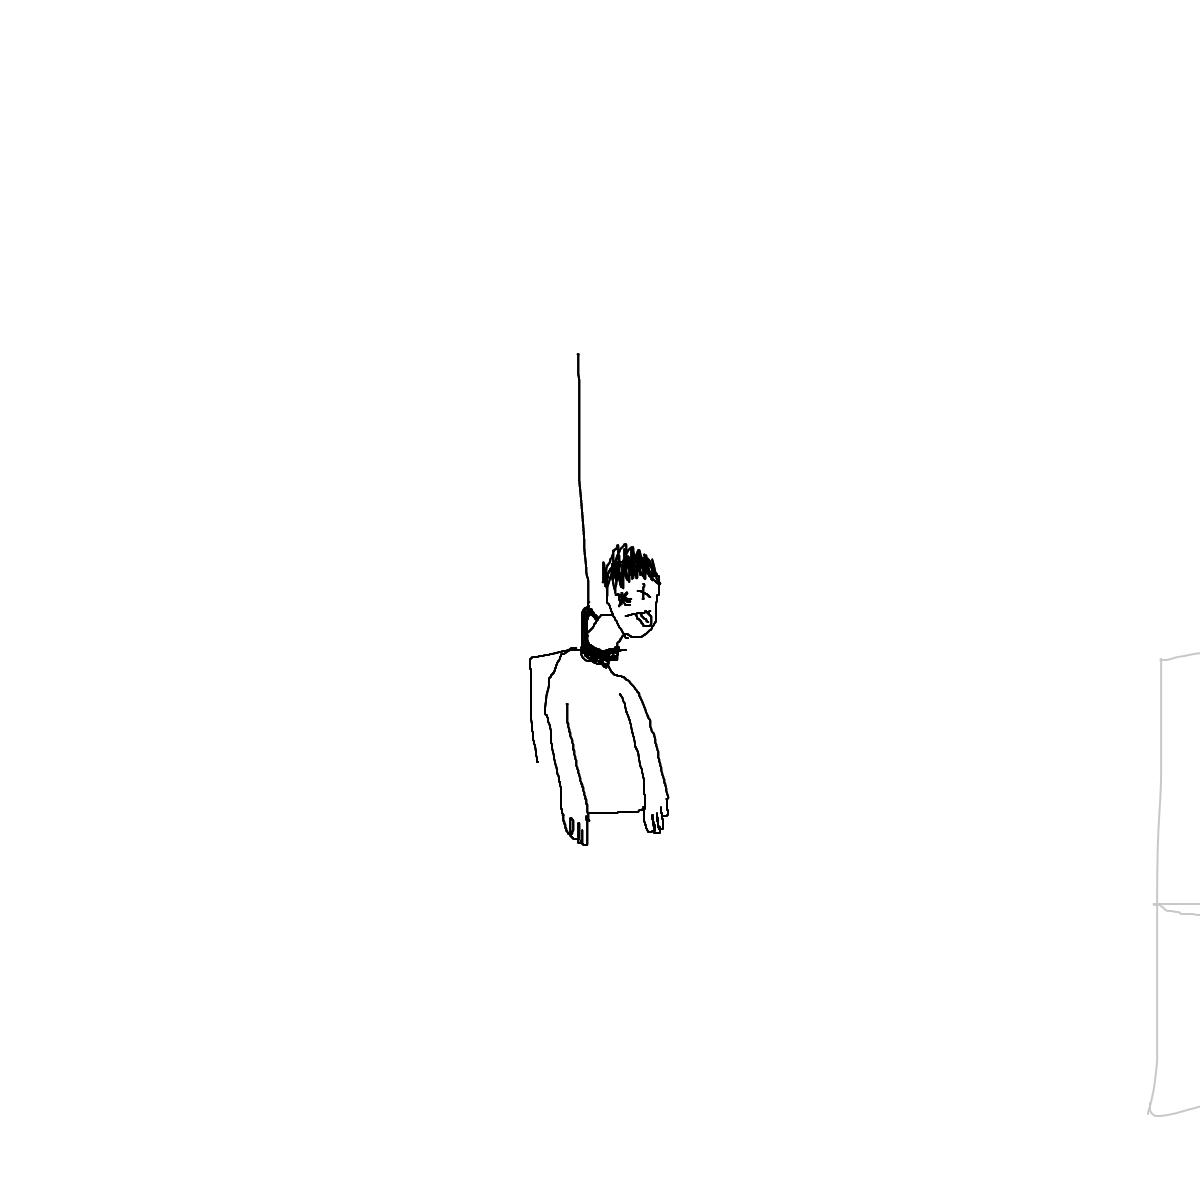 BAAAM drawing#23890 lat:37.0687675476074200lng: -94.5047302246093800